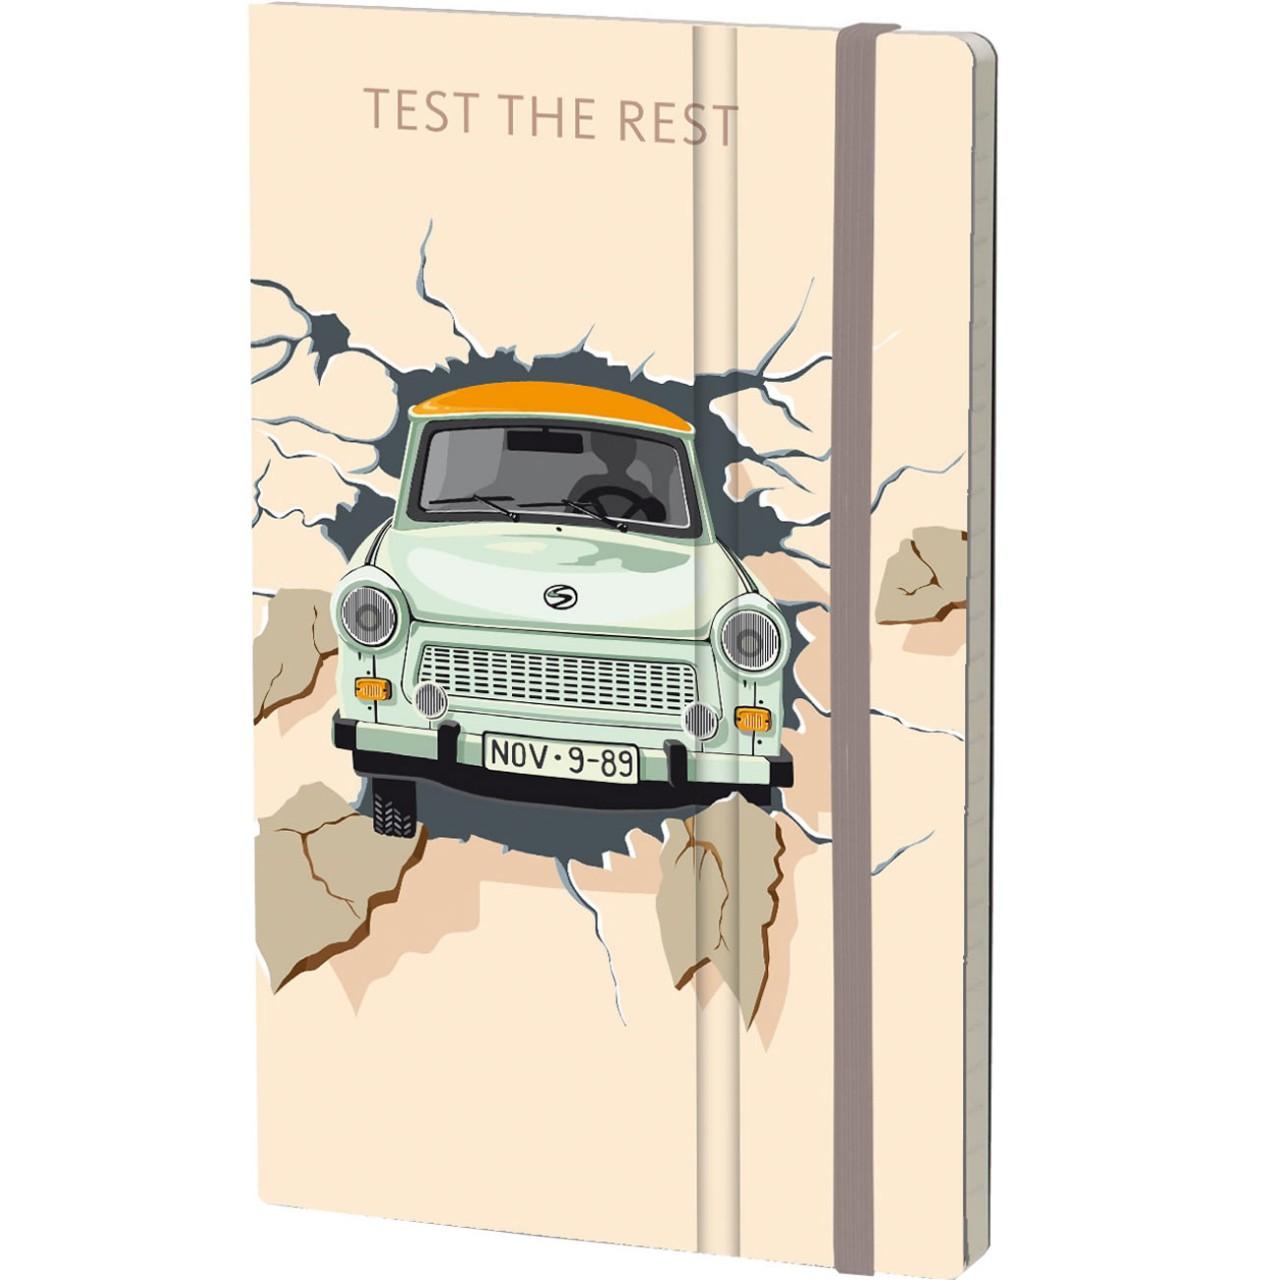 Stifflex Notizbuch THE WALL 9 x 14 cm 144 S., TEST THE REST - ORANGE